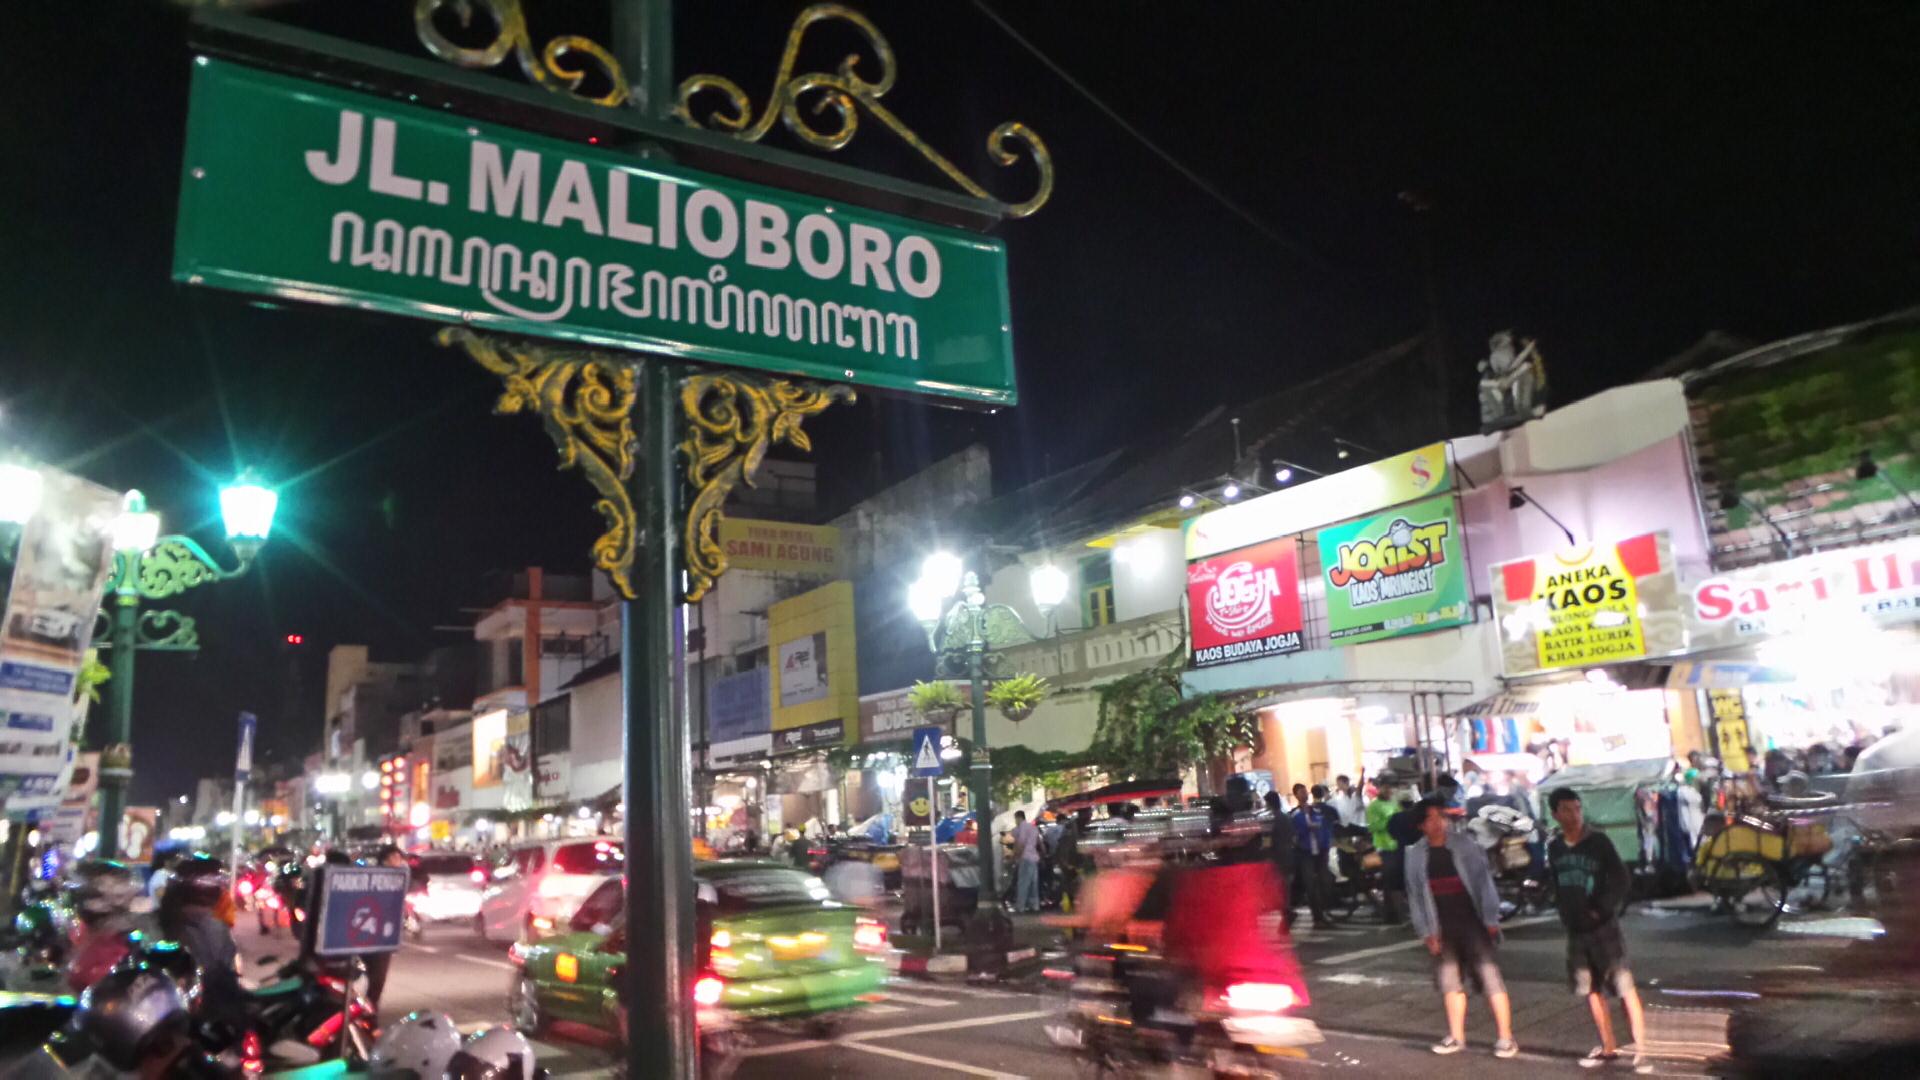 detinasi wisata jogja, jl.malioboro